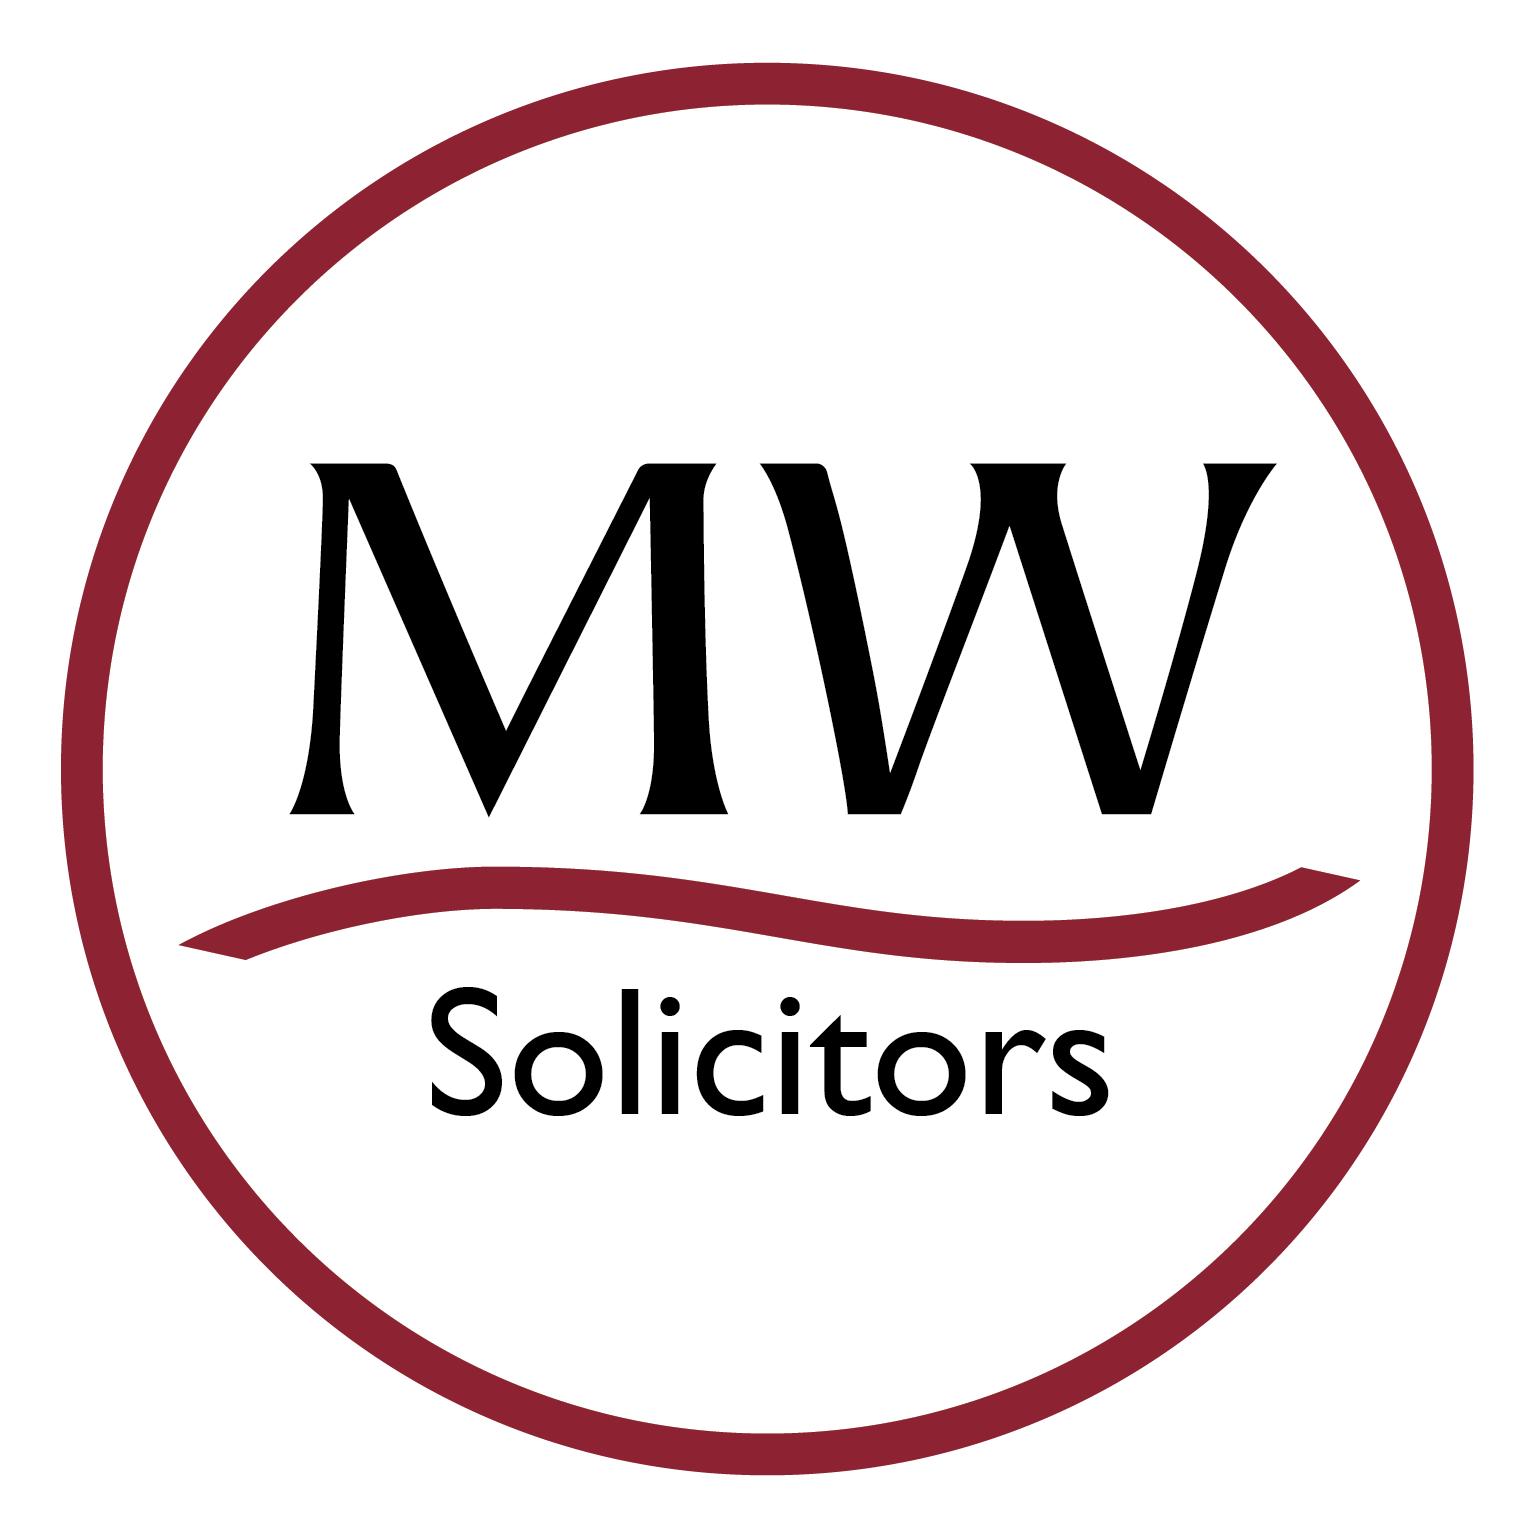 McMillan Williams Solicitors Ltd - Brighton, East Sussex  BN2 0JB - 01273 447884 | ShowMeLocal.com